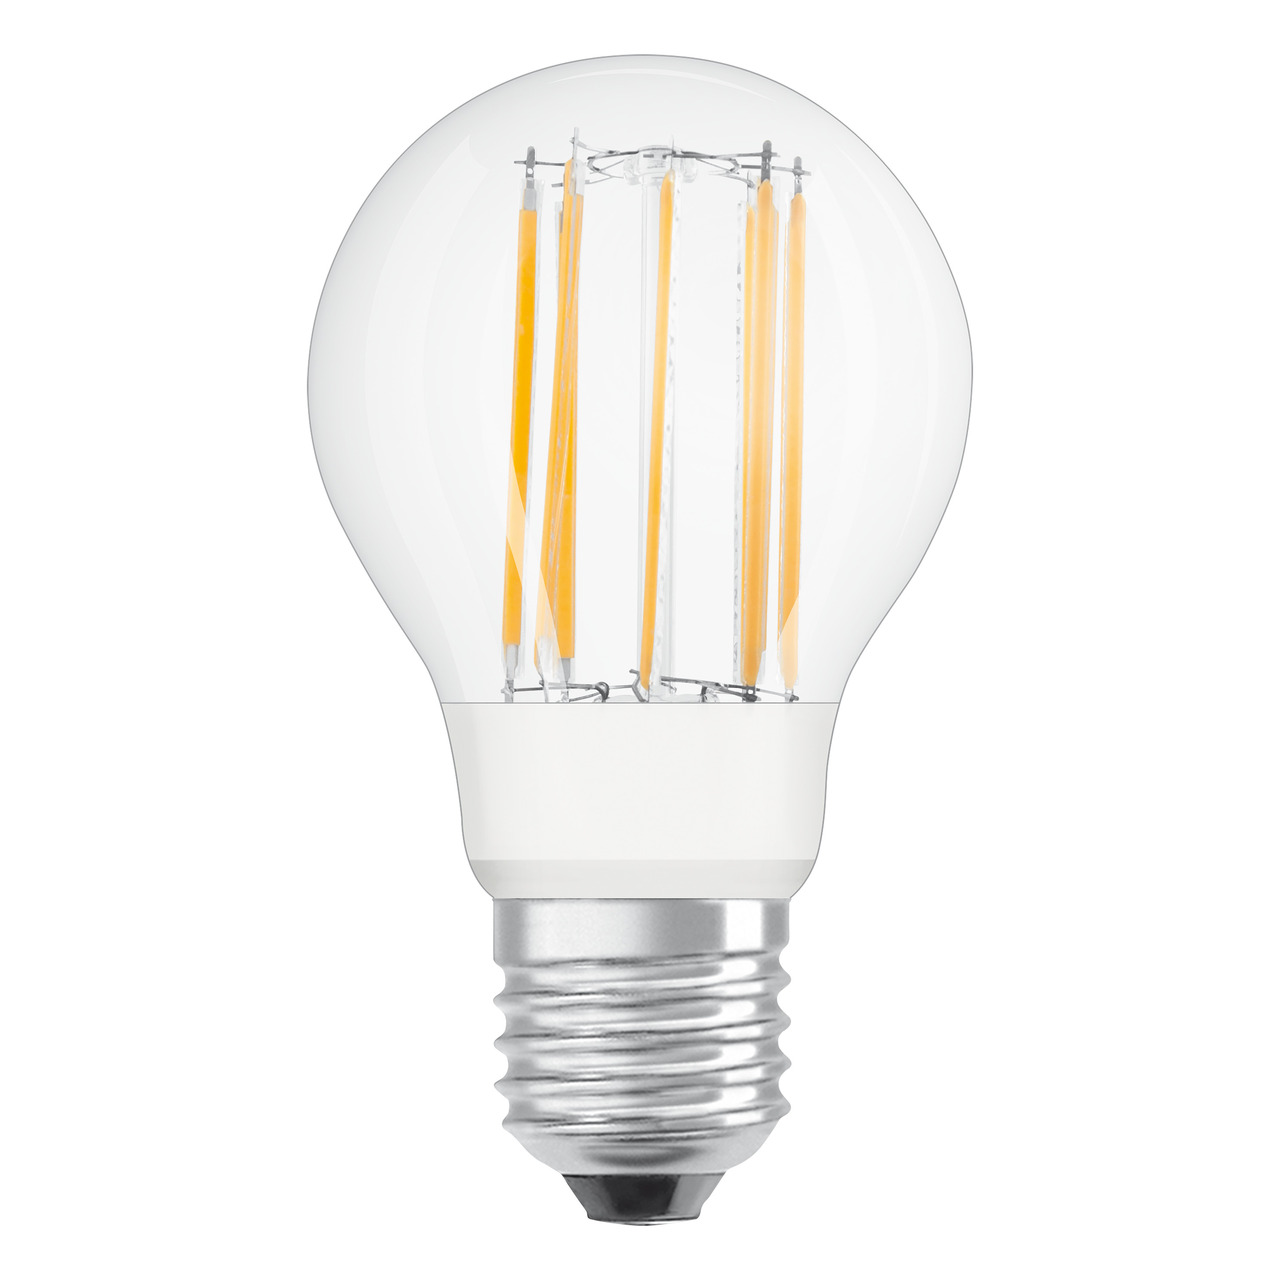 OSRAM LED SUPERSTAR RETROFIT 9-W-Filament-LED-Lampe E27- warmweiss- klar- dimmbar